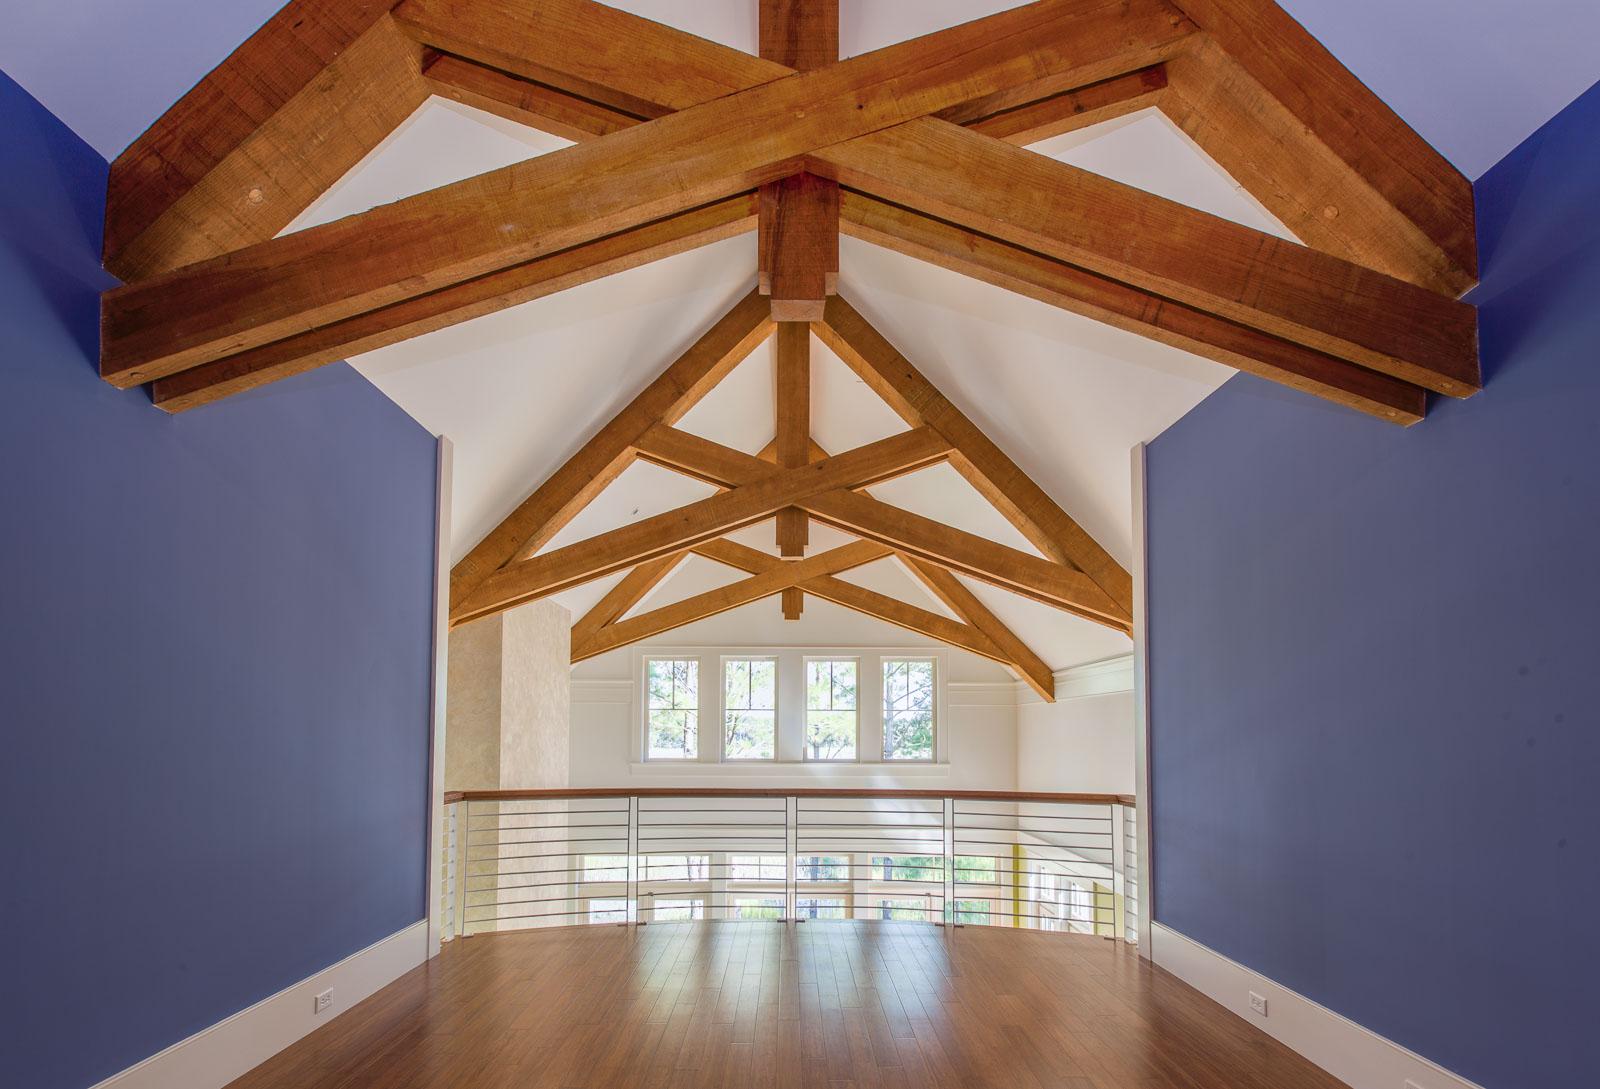 Charleston interior architectural photography of HGTV Dream house